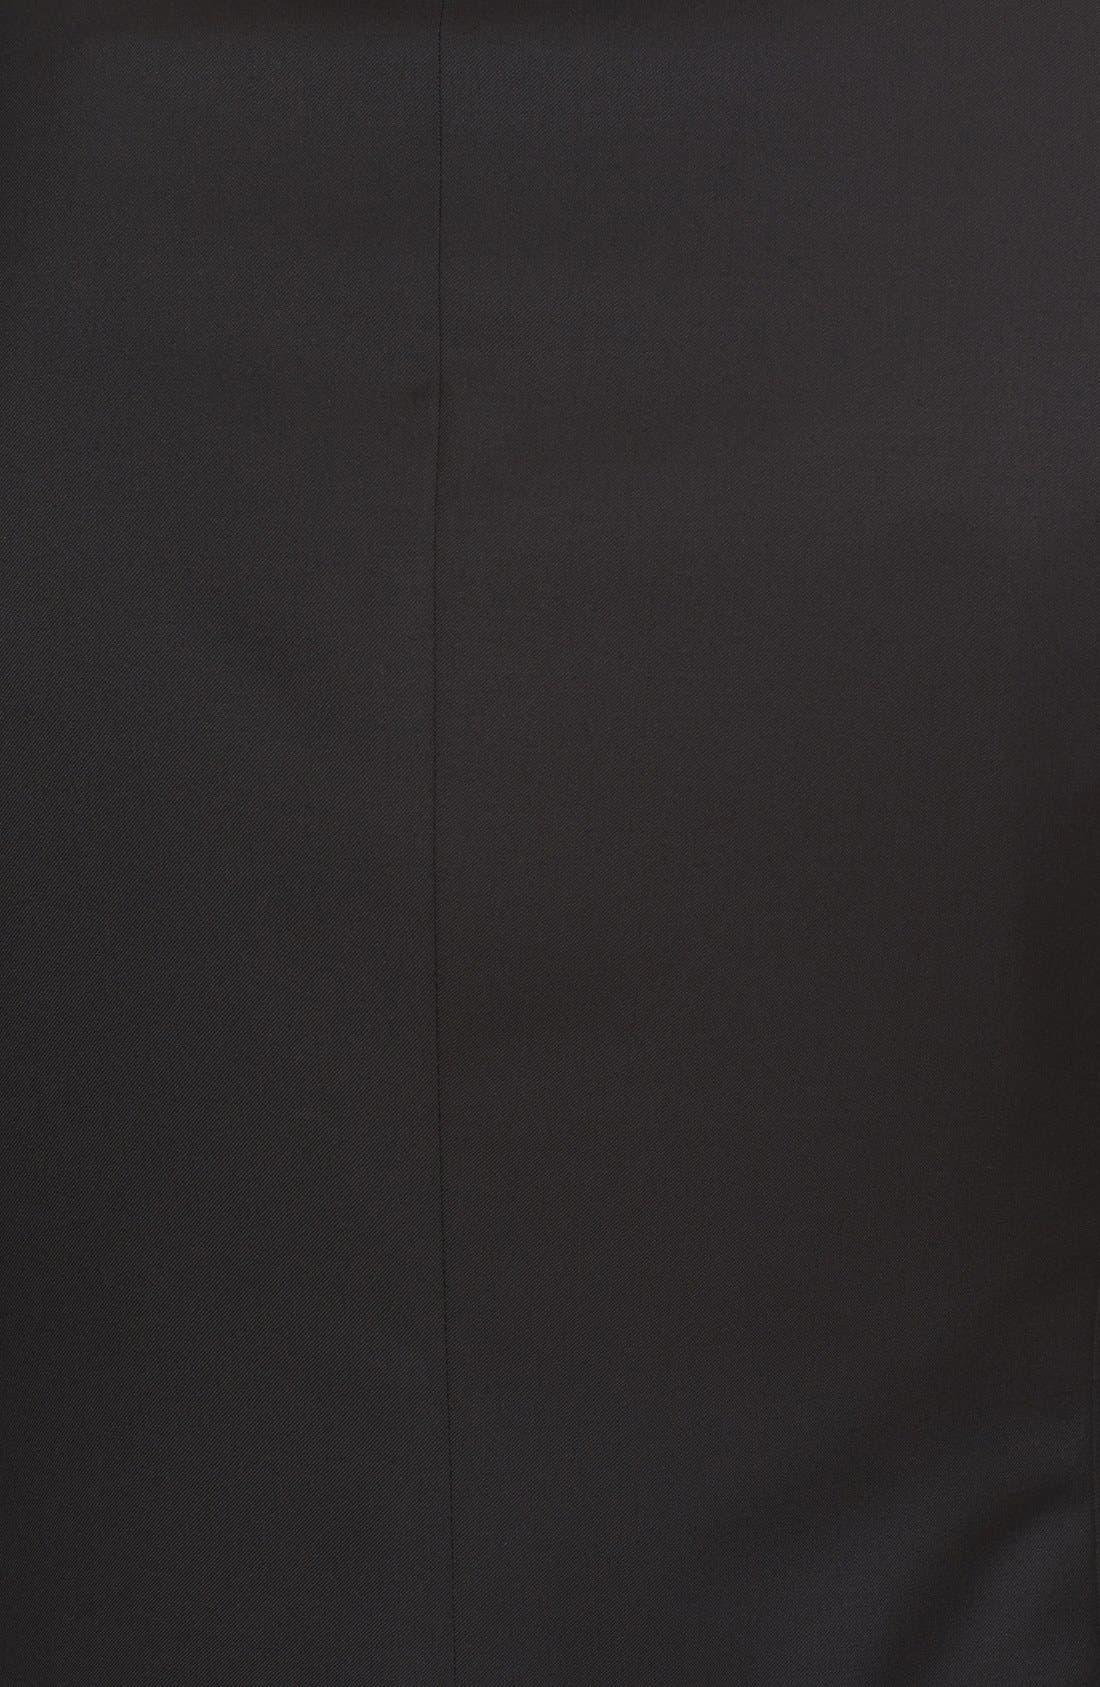 Trim Fit Wool & Mohair Tuxedo,                             Alternate thumbnail 6, color,                             Black